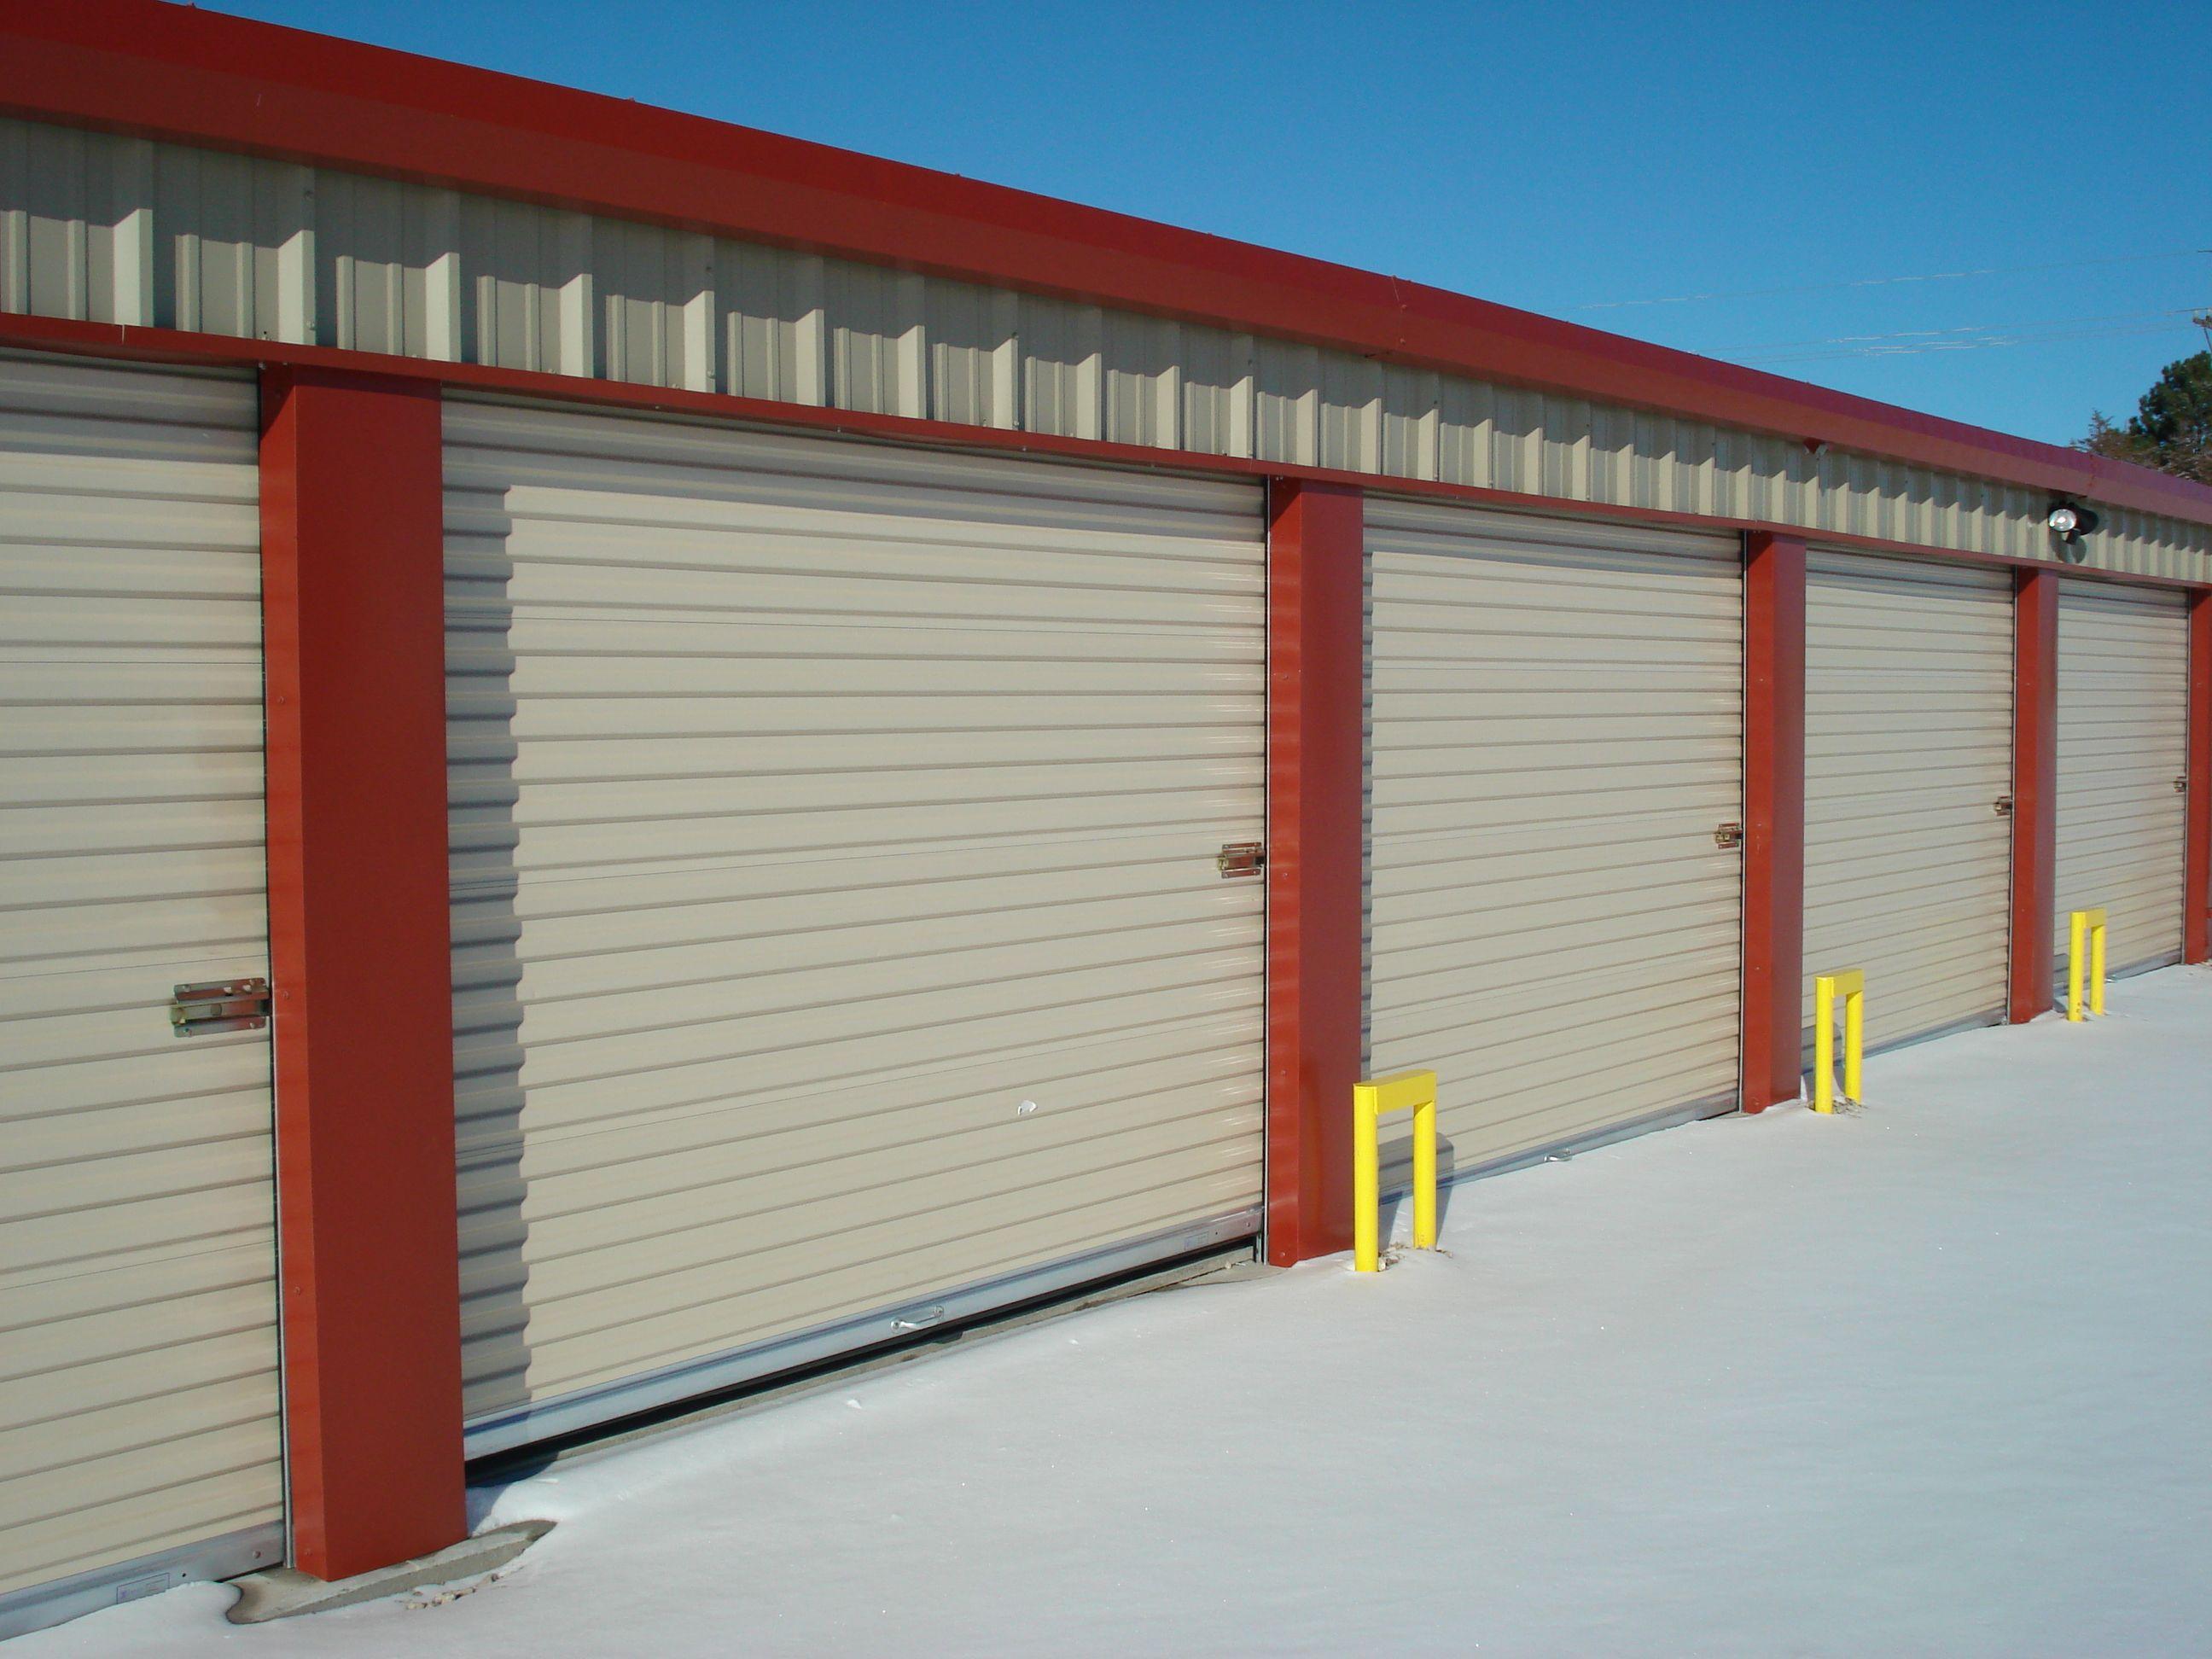 doctor pembroke florida the pines closet garage in storage wall door rx units custom south repair